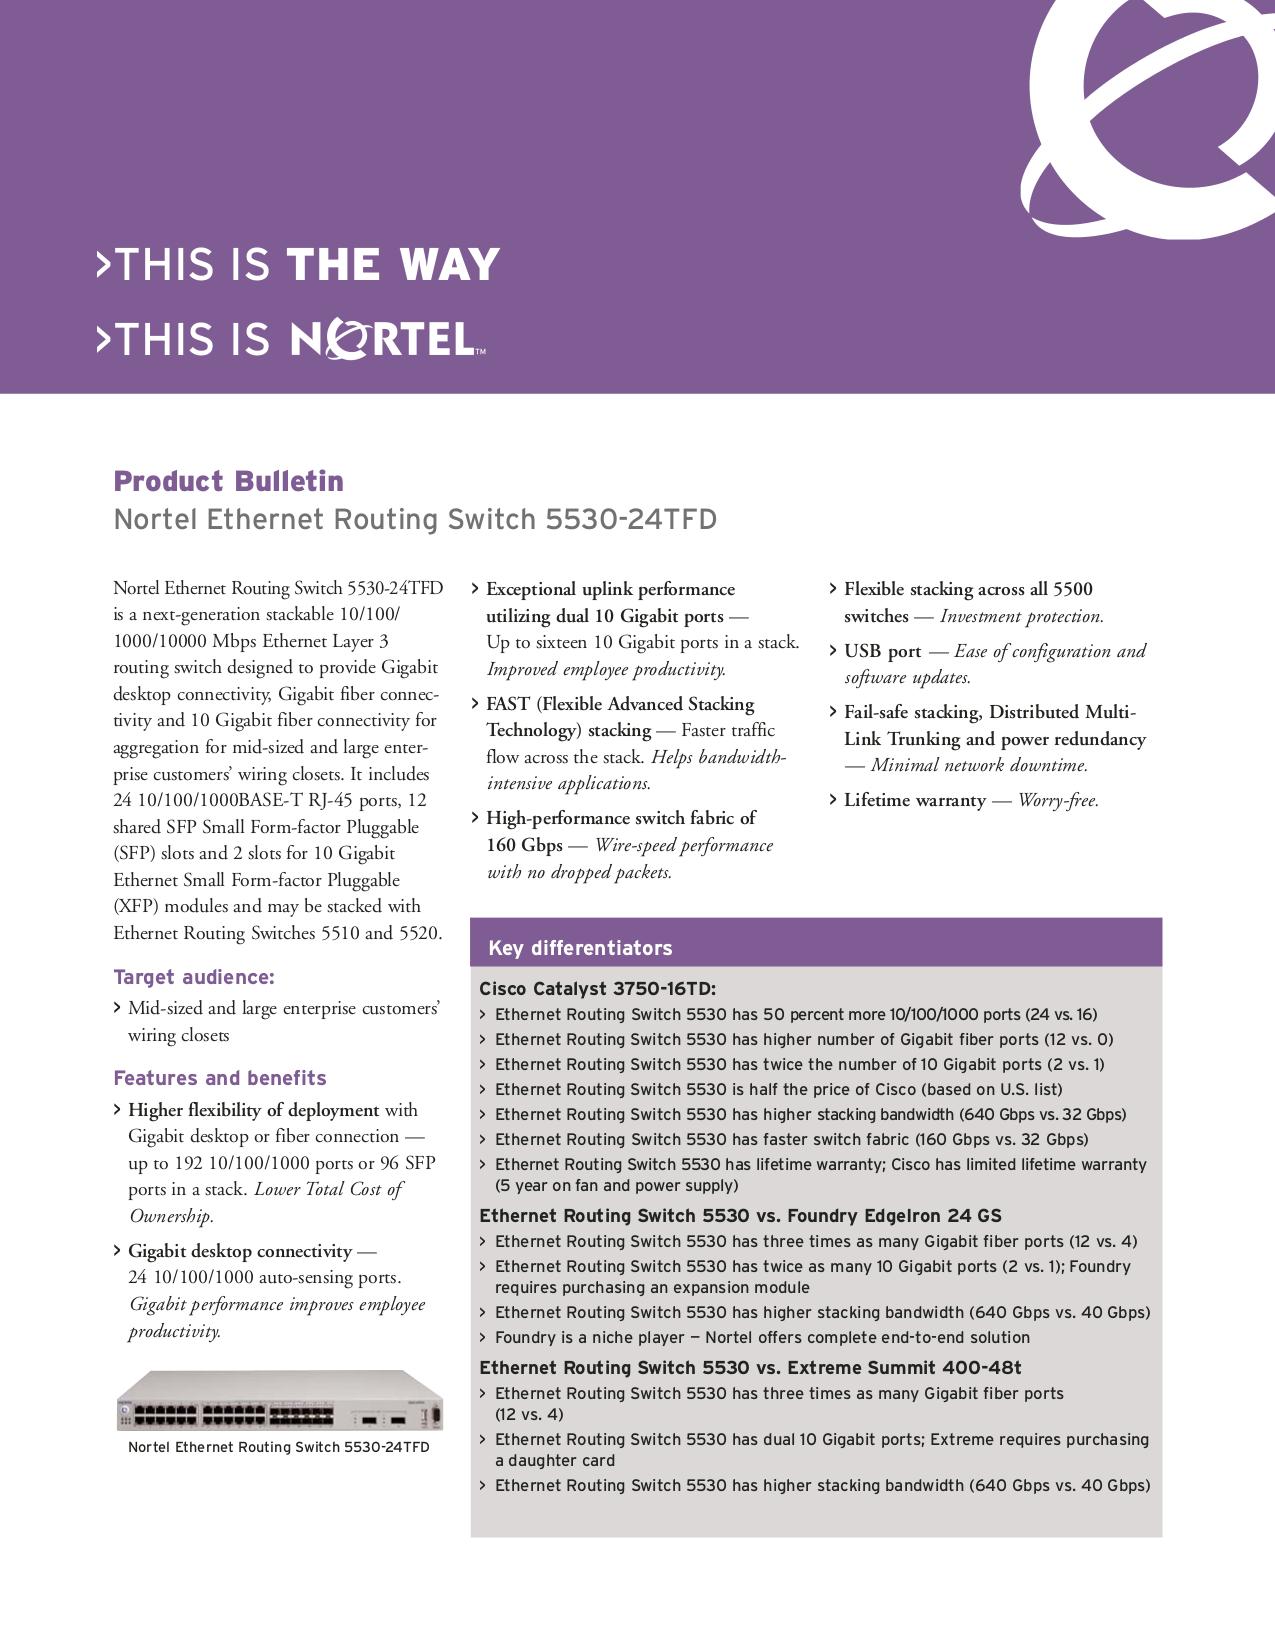 pdf for Nortel Router BCN manual